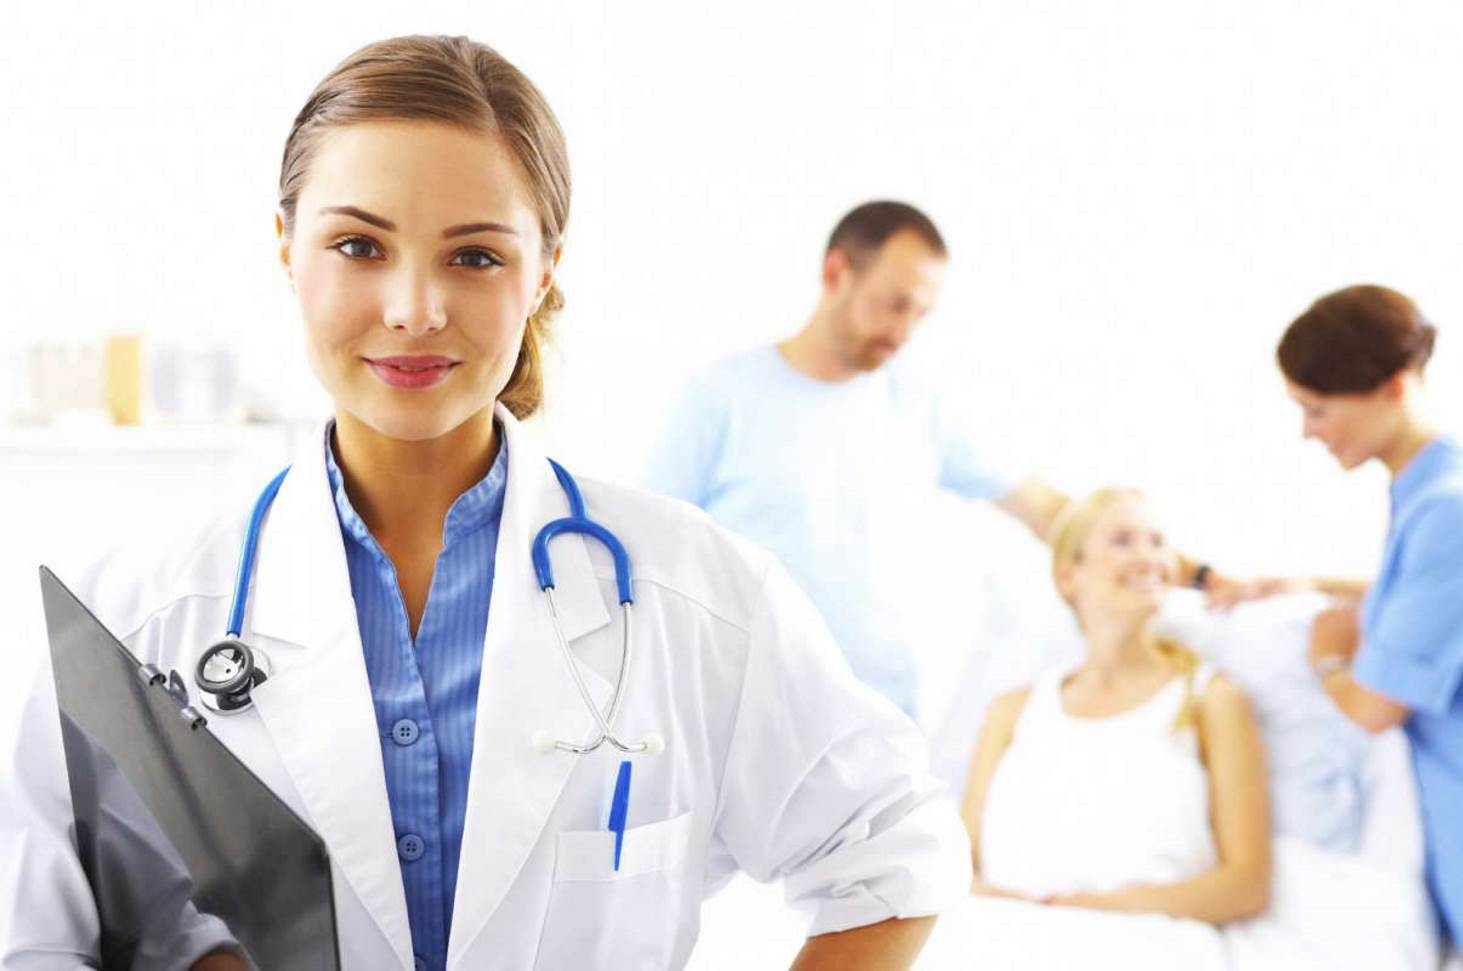 v-shkolah-predlozhili-vvesti-v-kurs-meditsinskoj-gramotnosti